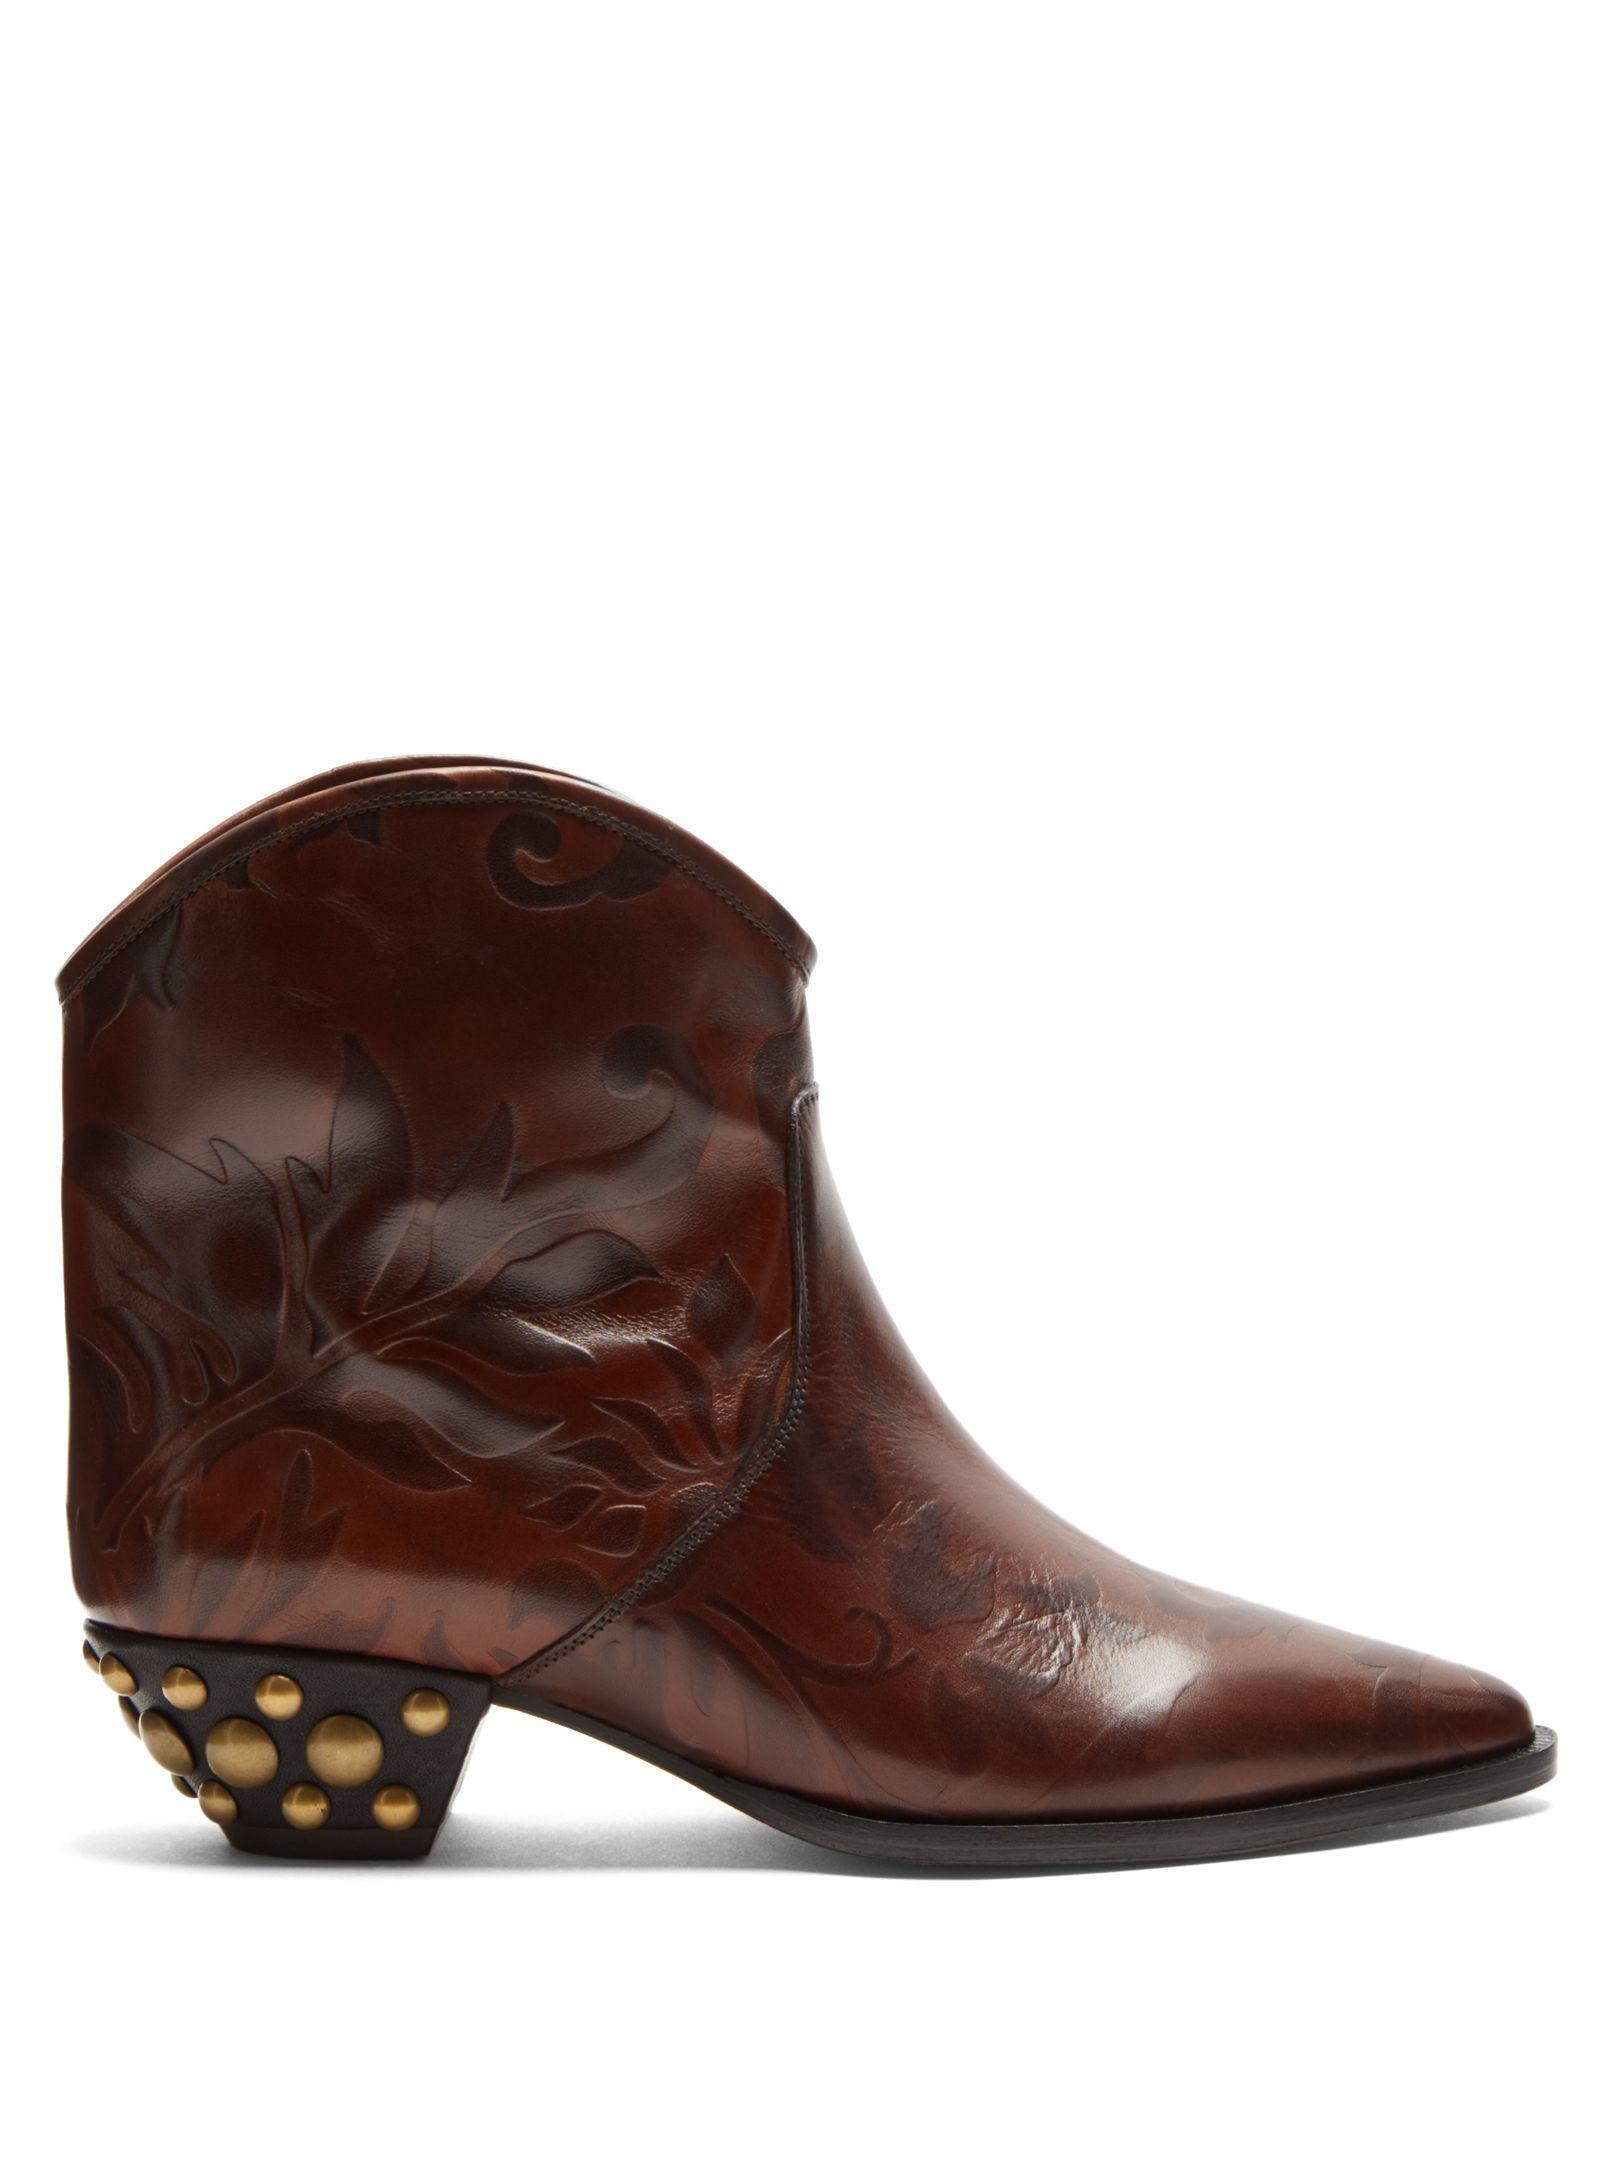 99aa52571bc ISABEL MARANT DAWINA EMBOSSED LEATHER ANKLE BOOTS.  isabelmarant  shoes